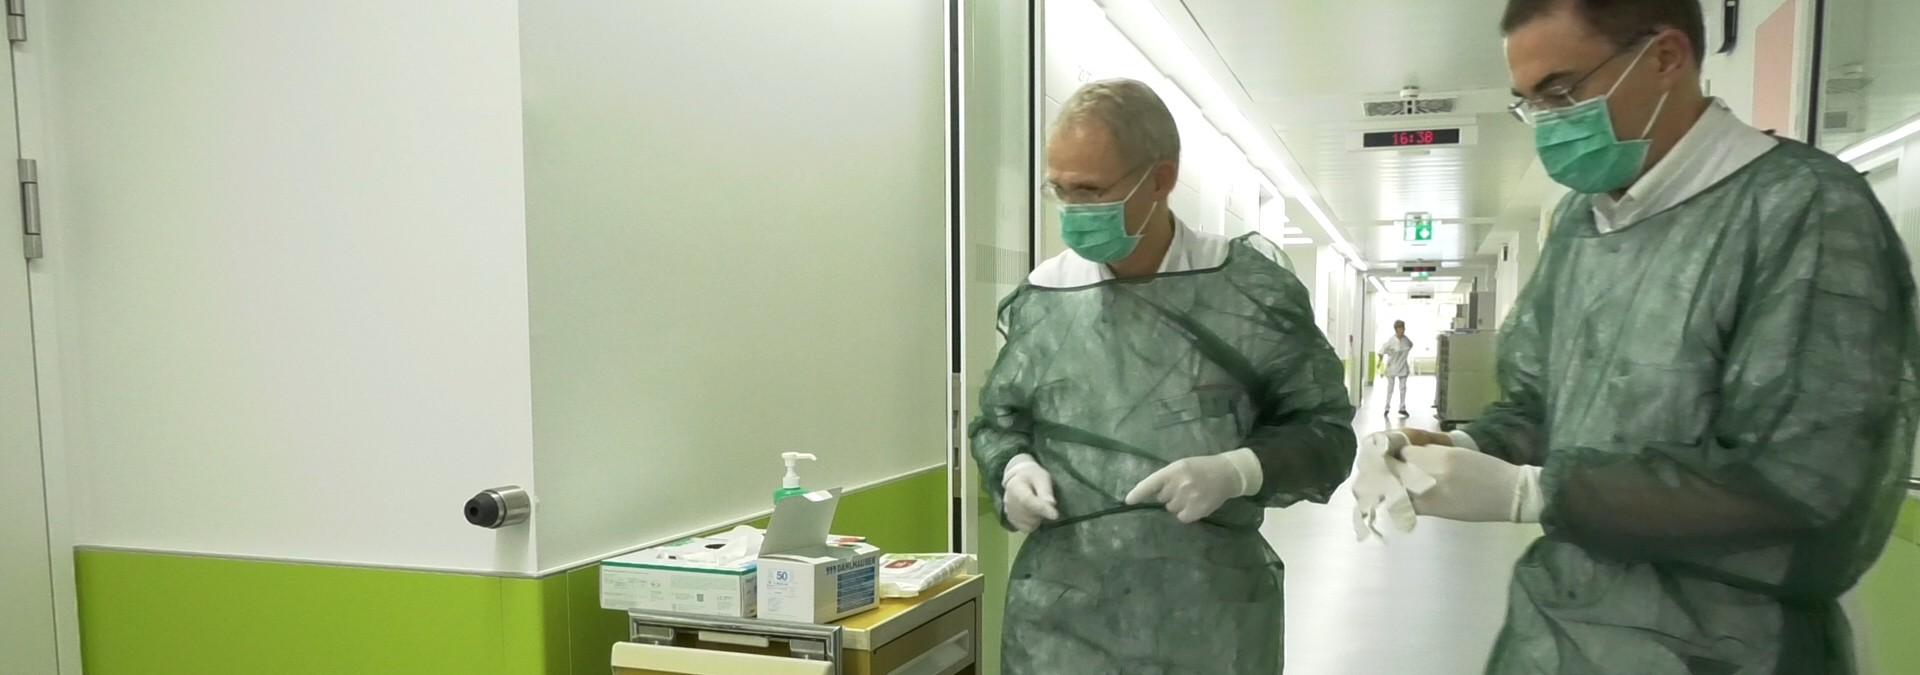 Coronavirus in Baden-Württemberg aufgetreten